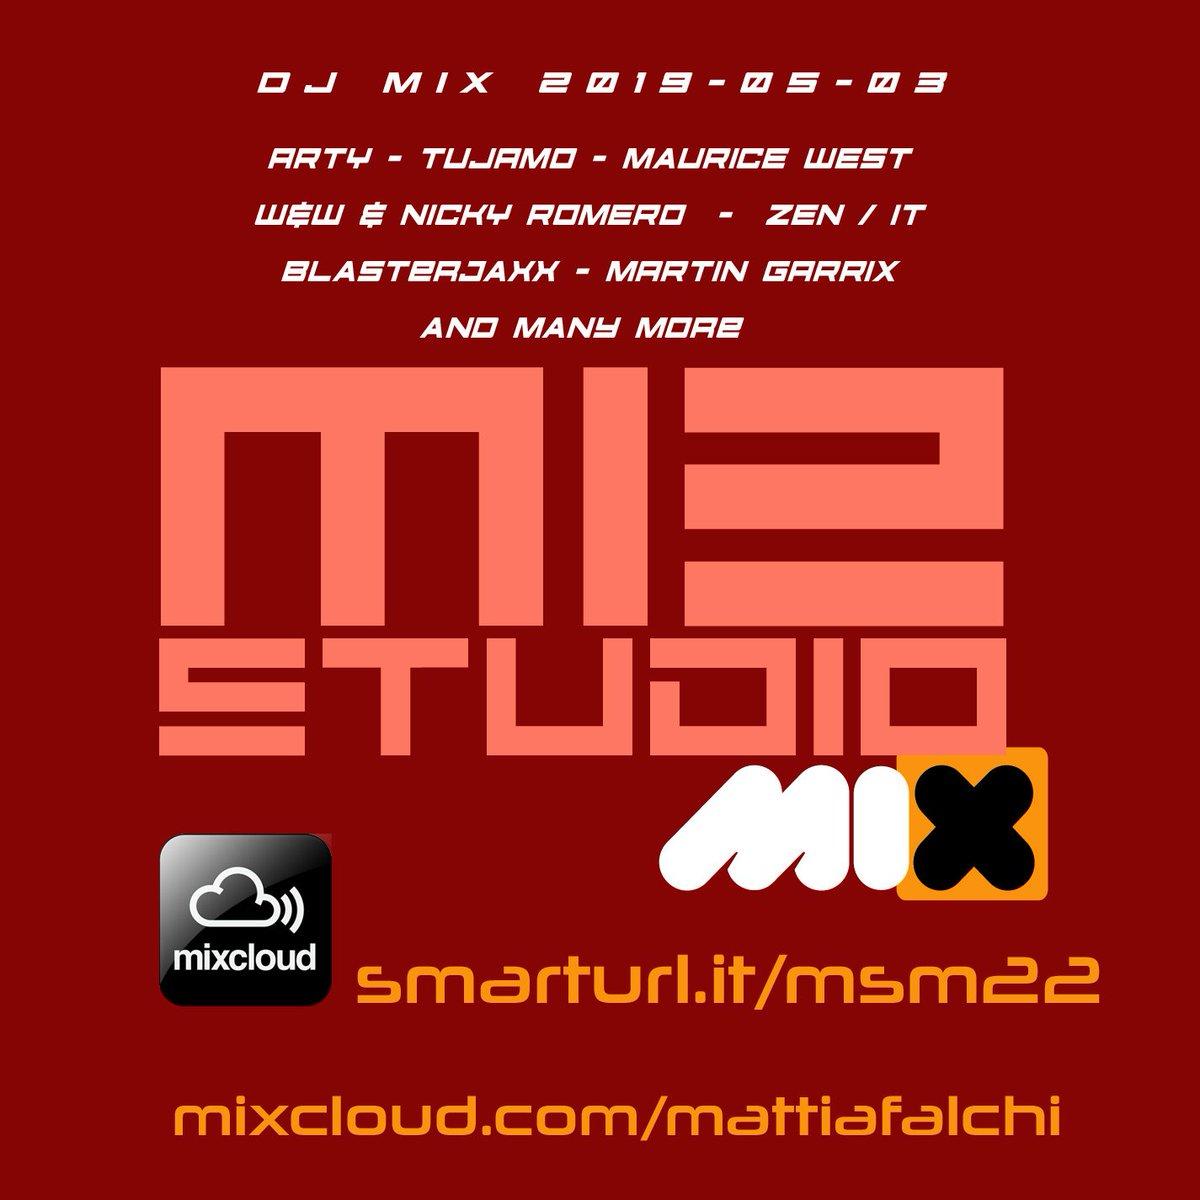 M12 STUDIO MIX (@m12studiomix) | Twitter